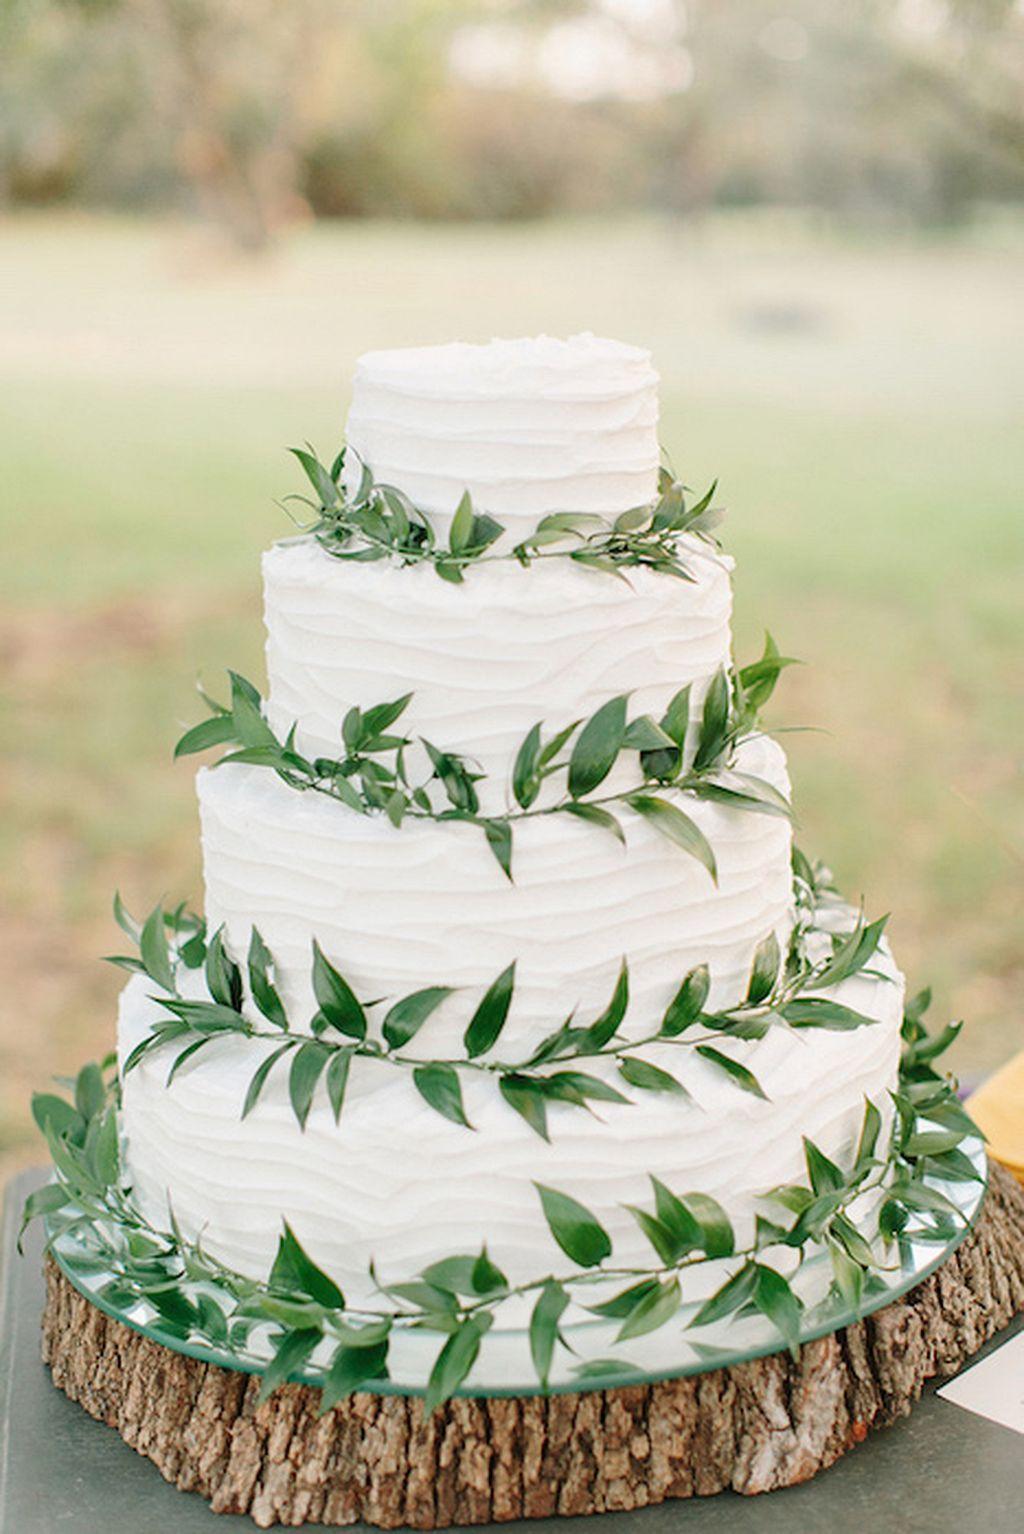 100+ Forest Wedding Ideas   Pinterest   Wedding cake, Weddings and ...